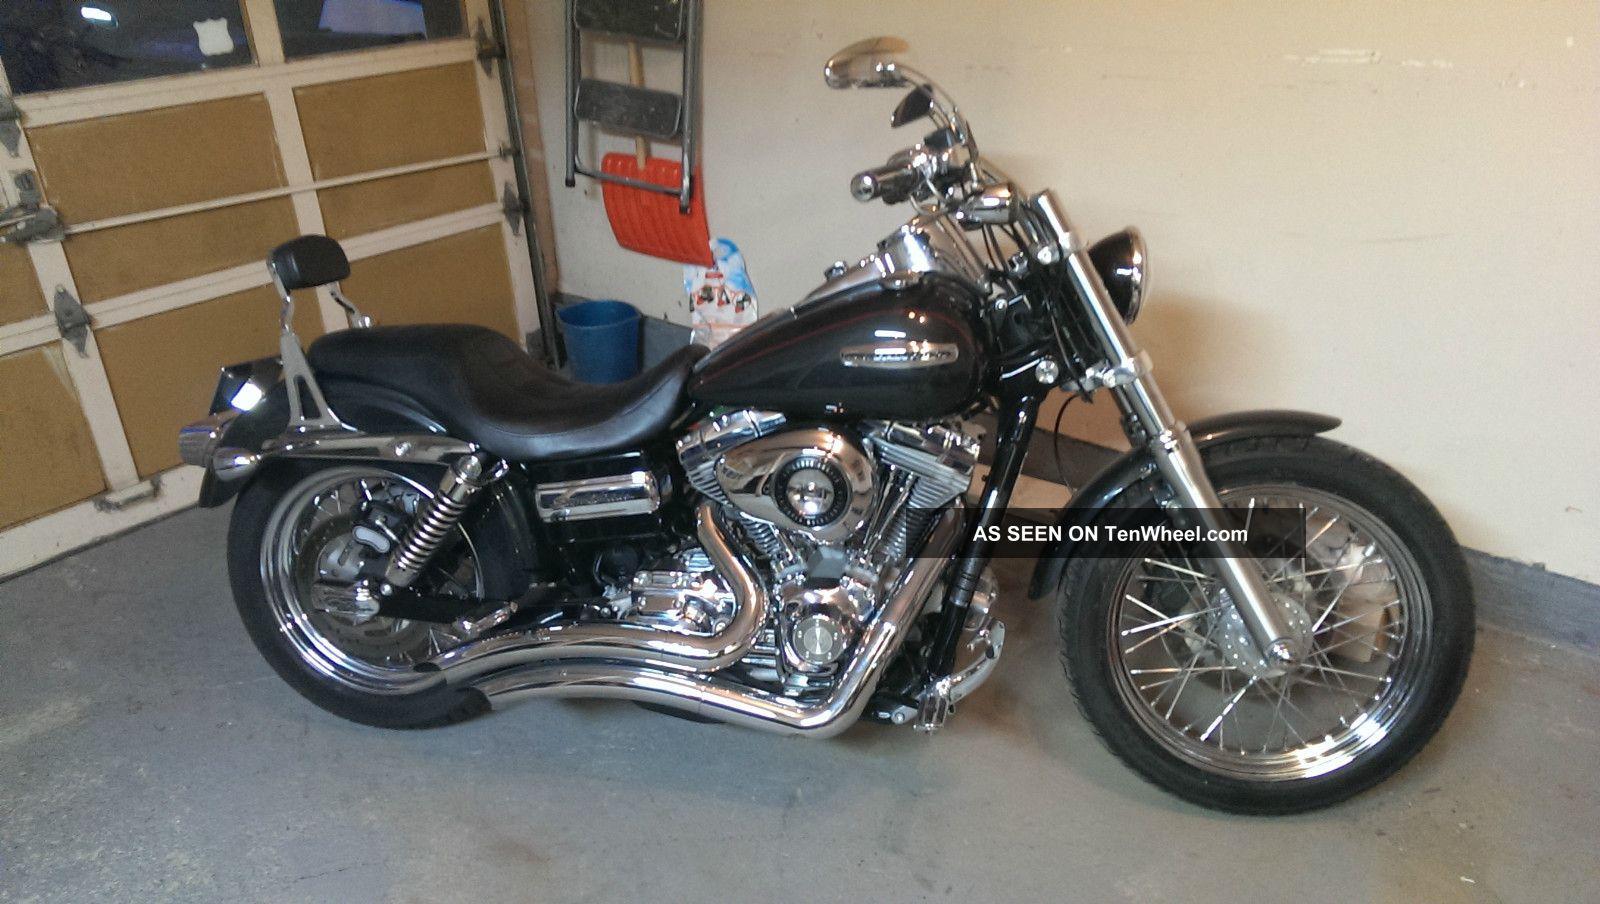 2008 Harley Davidson Dyna Glide Custom: 2008 Harley Davidson Dyna Glide Custom